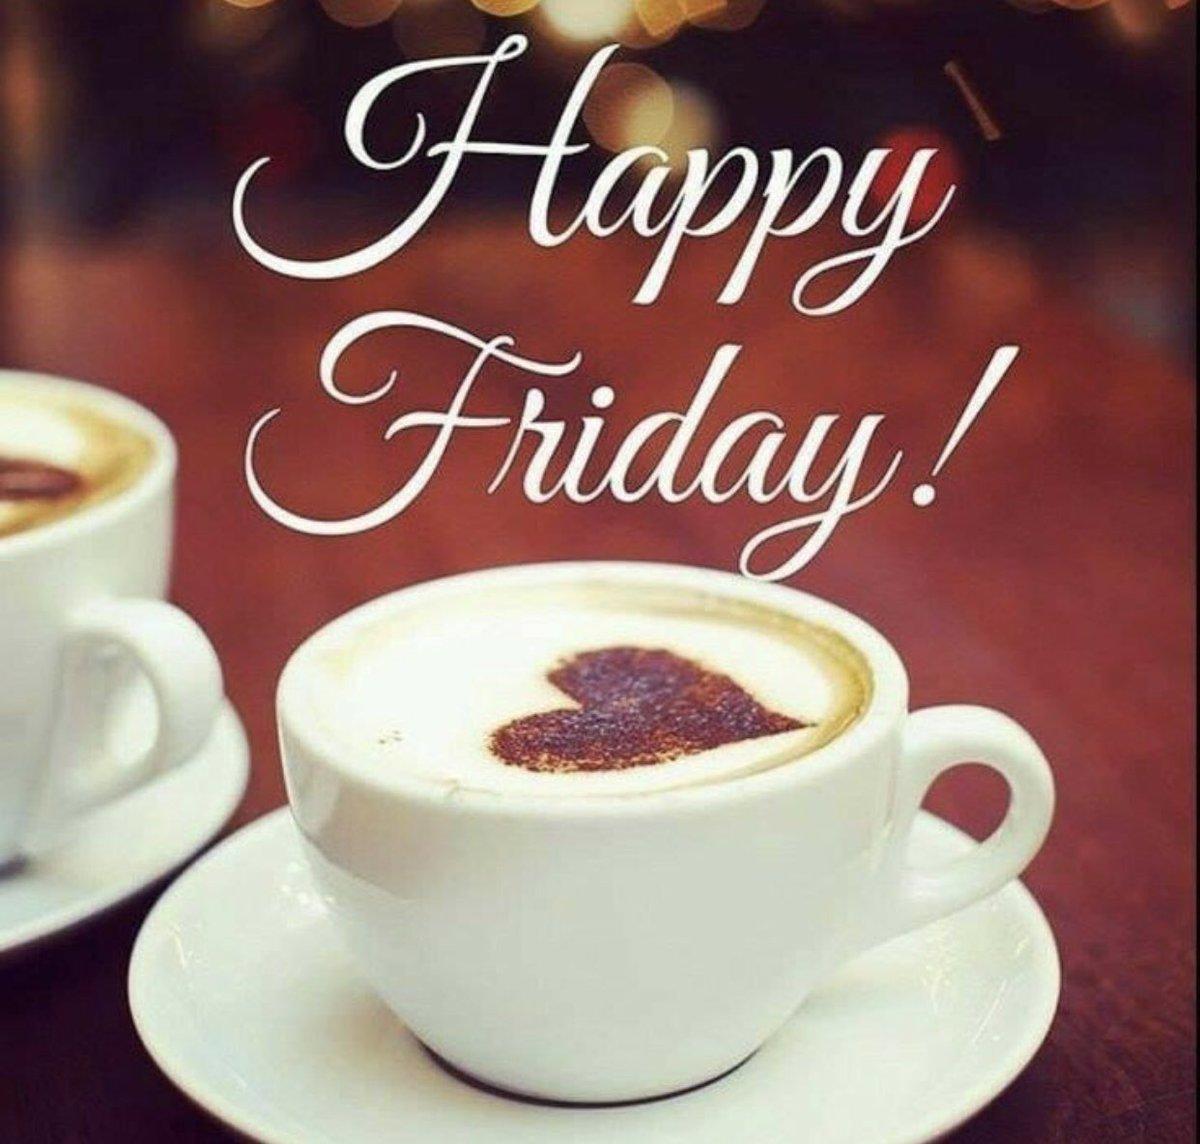 #Friday coffee tastes best! ☕️❤️😘 #Fridayvibes #Fridaymorning #Fridaycoffee